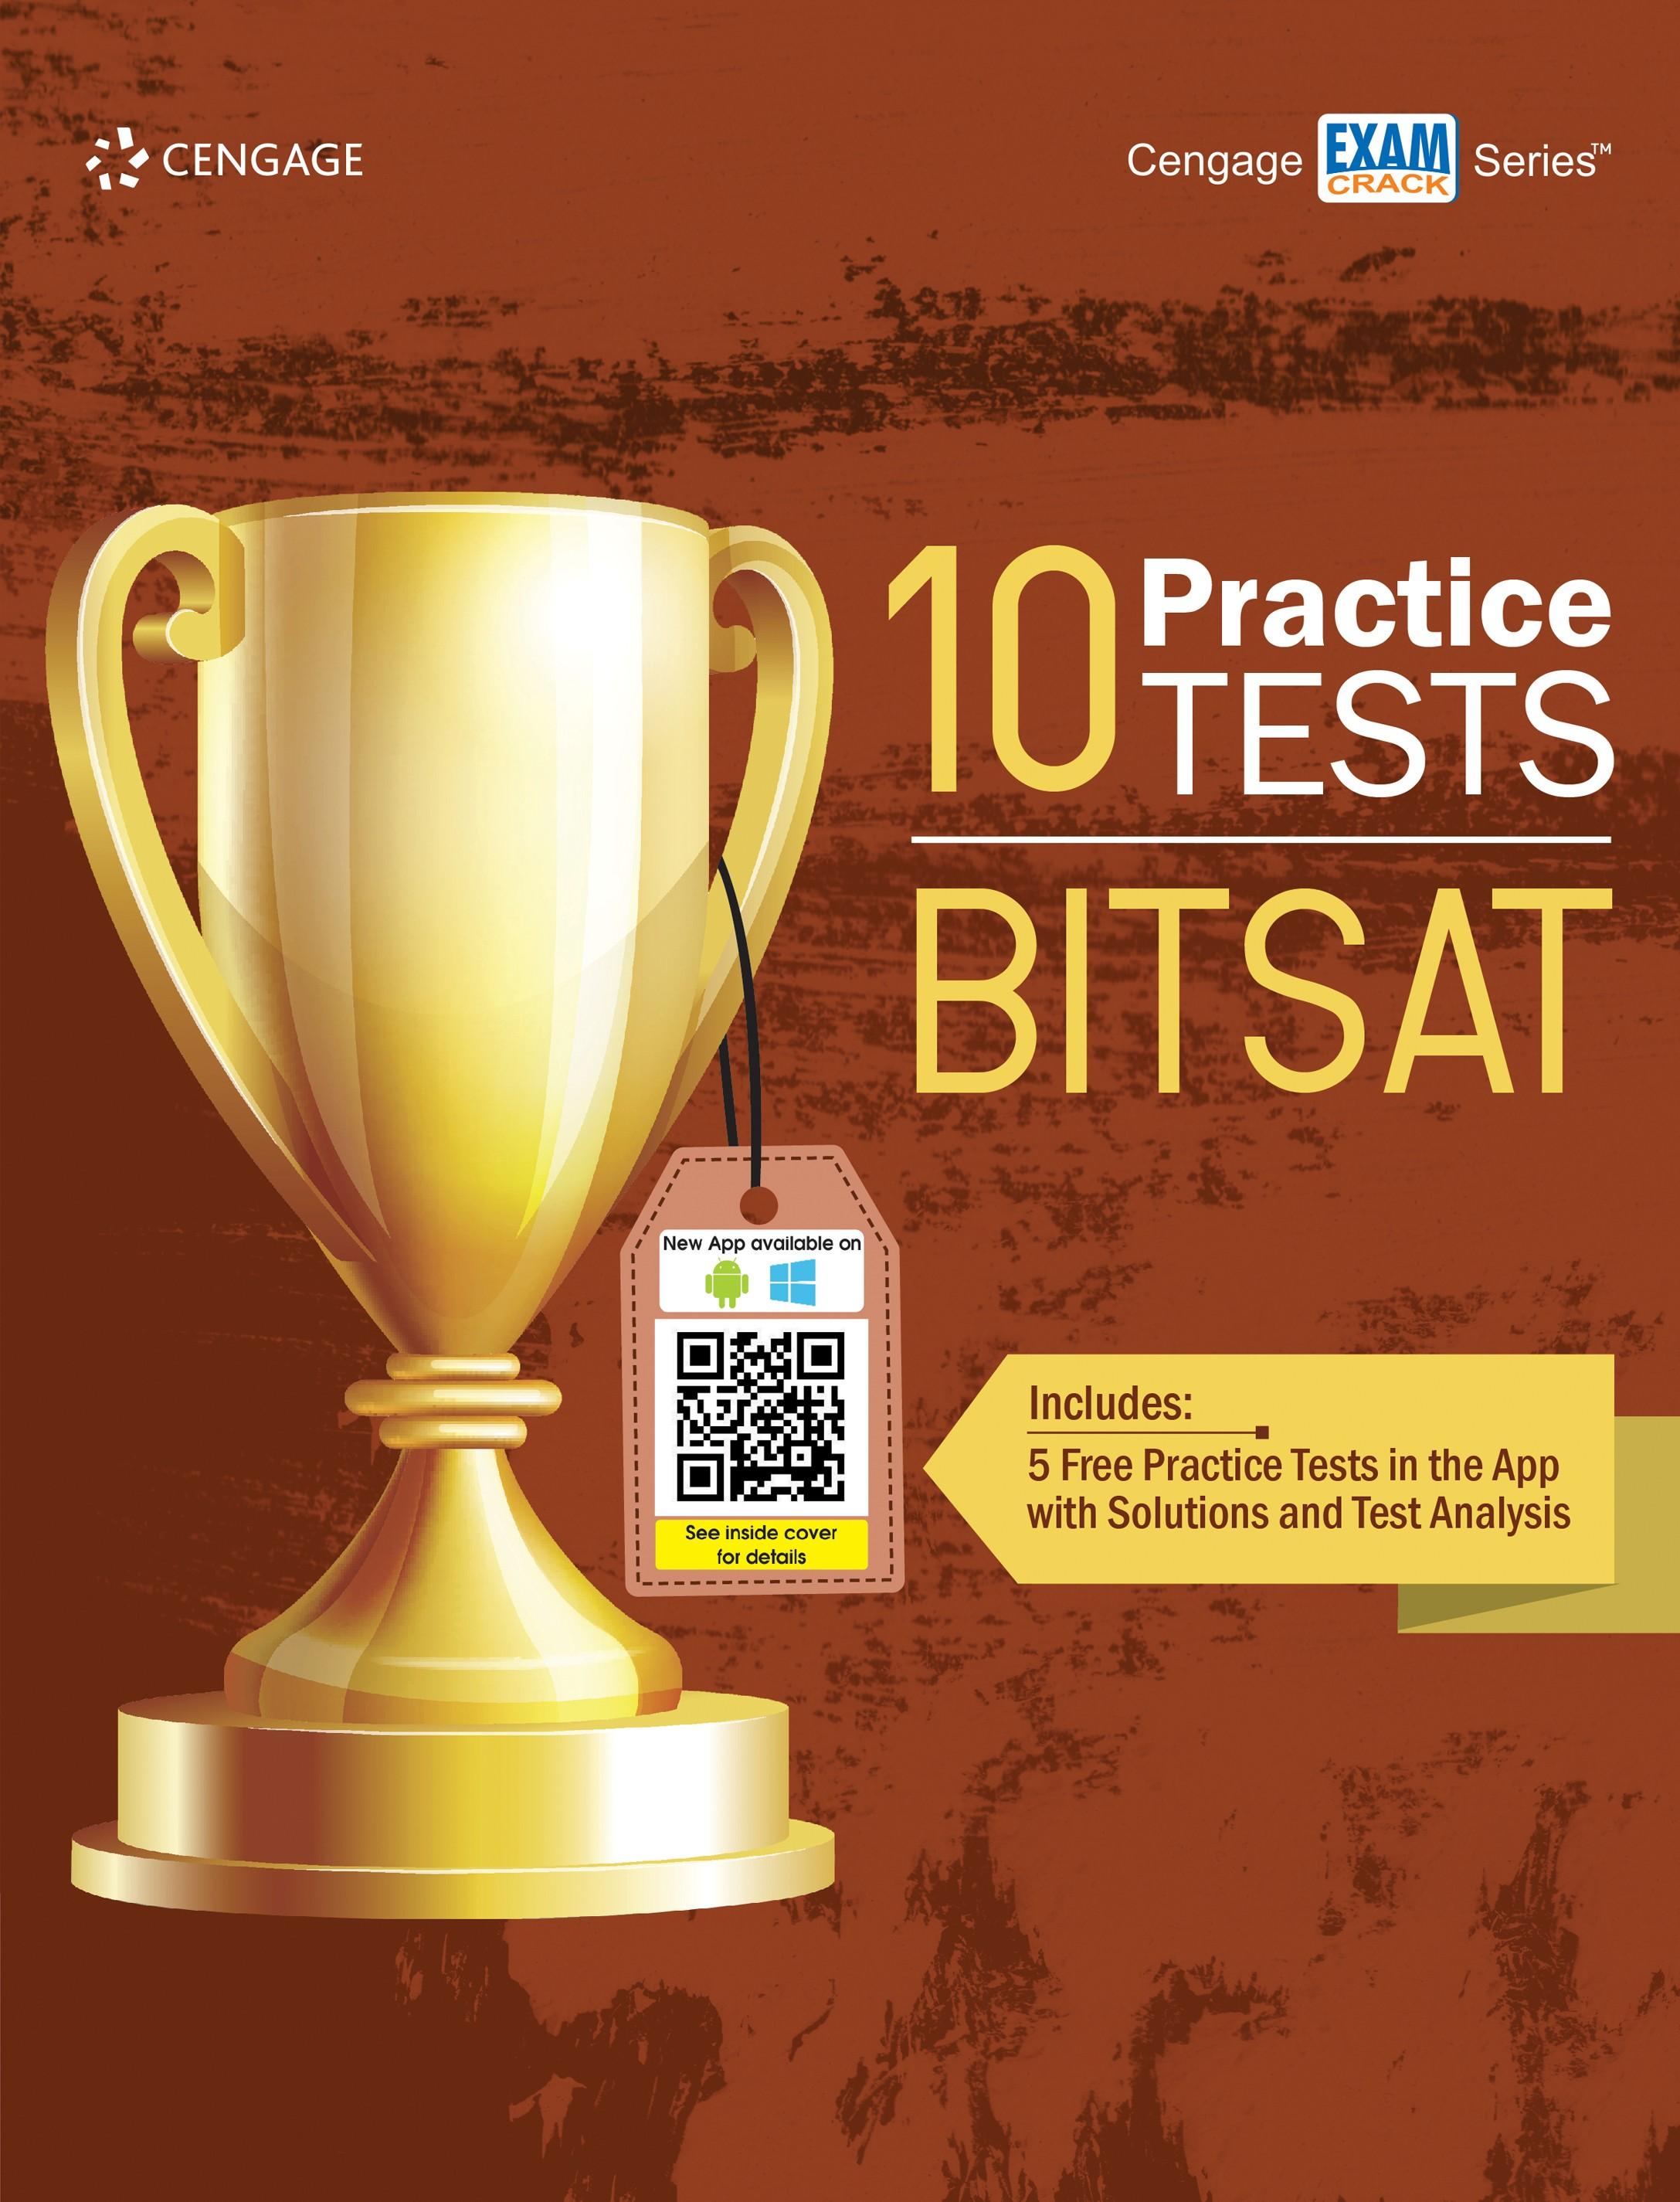 10 Practice Tests Bitsat